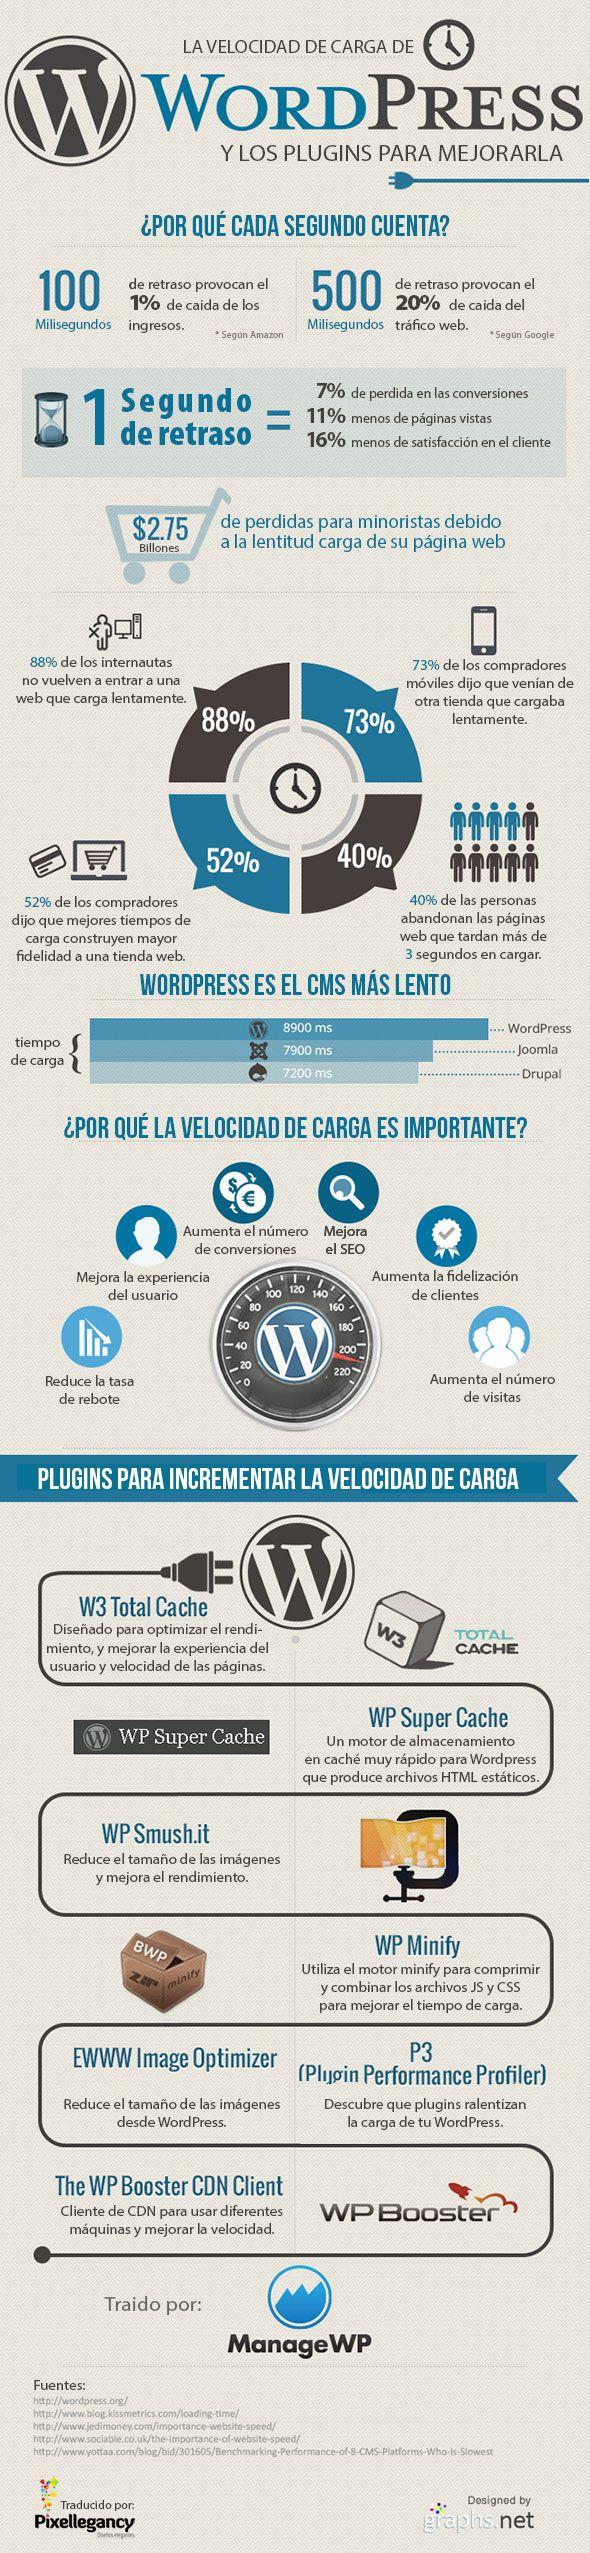 La importancia de la velocidad de carga en WordPress #infografia